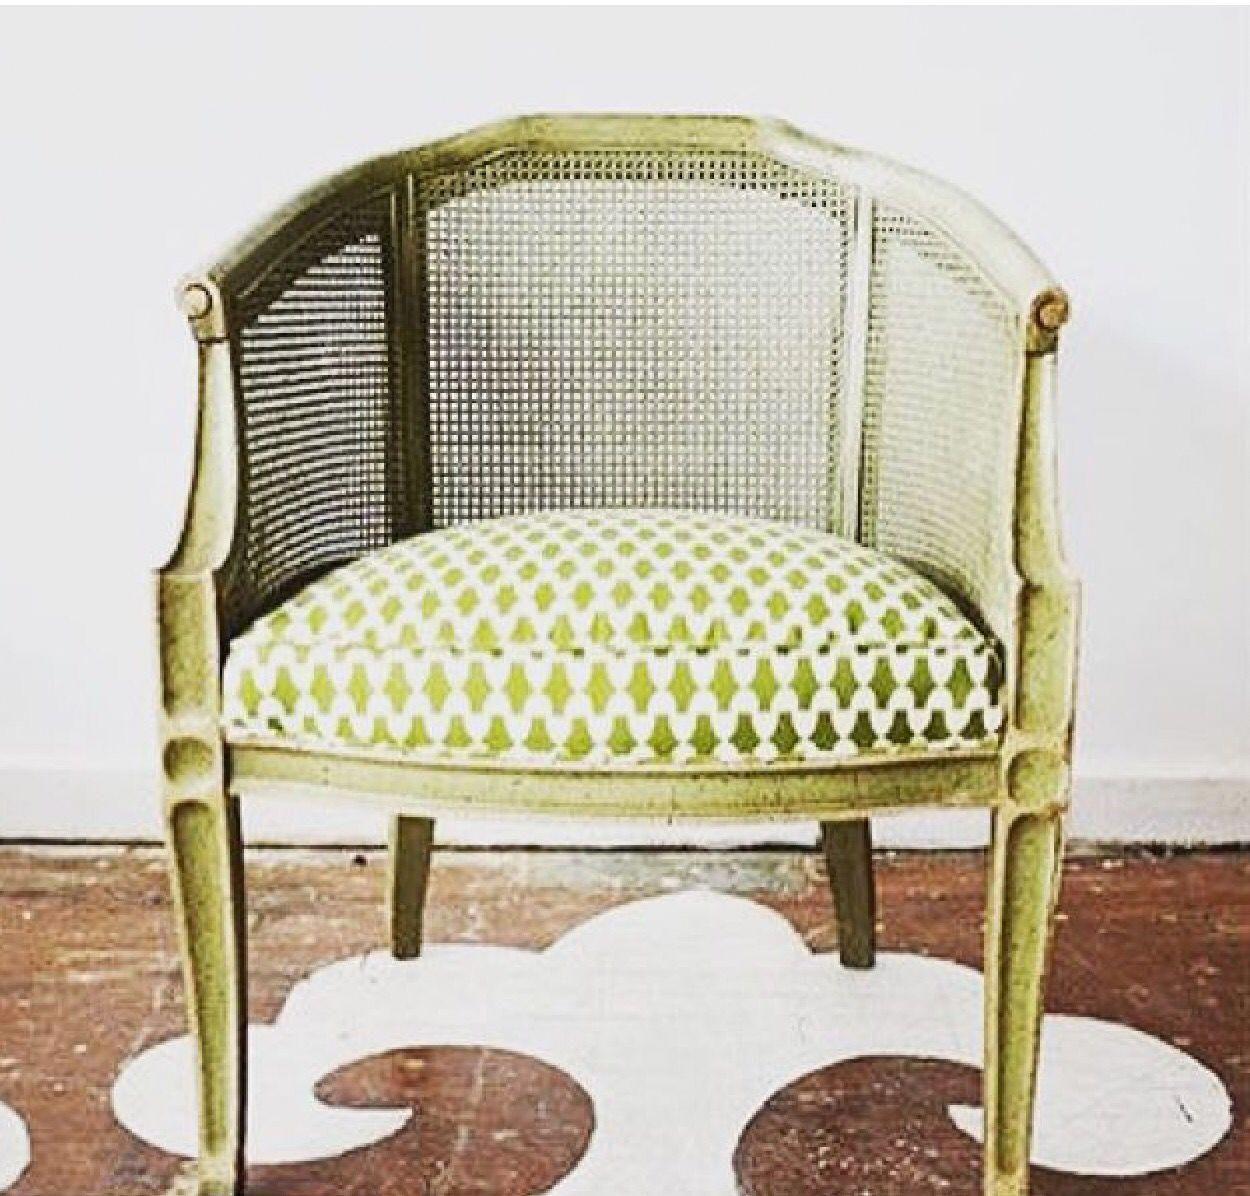 Divani In Finto Rattan.Big Comfy Oversized Chairs Smalloccasionalarmchair